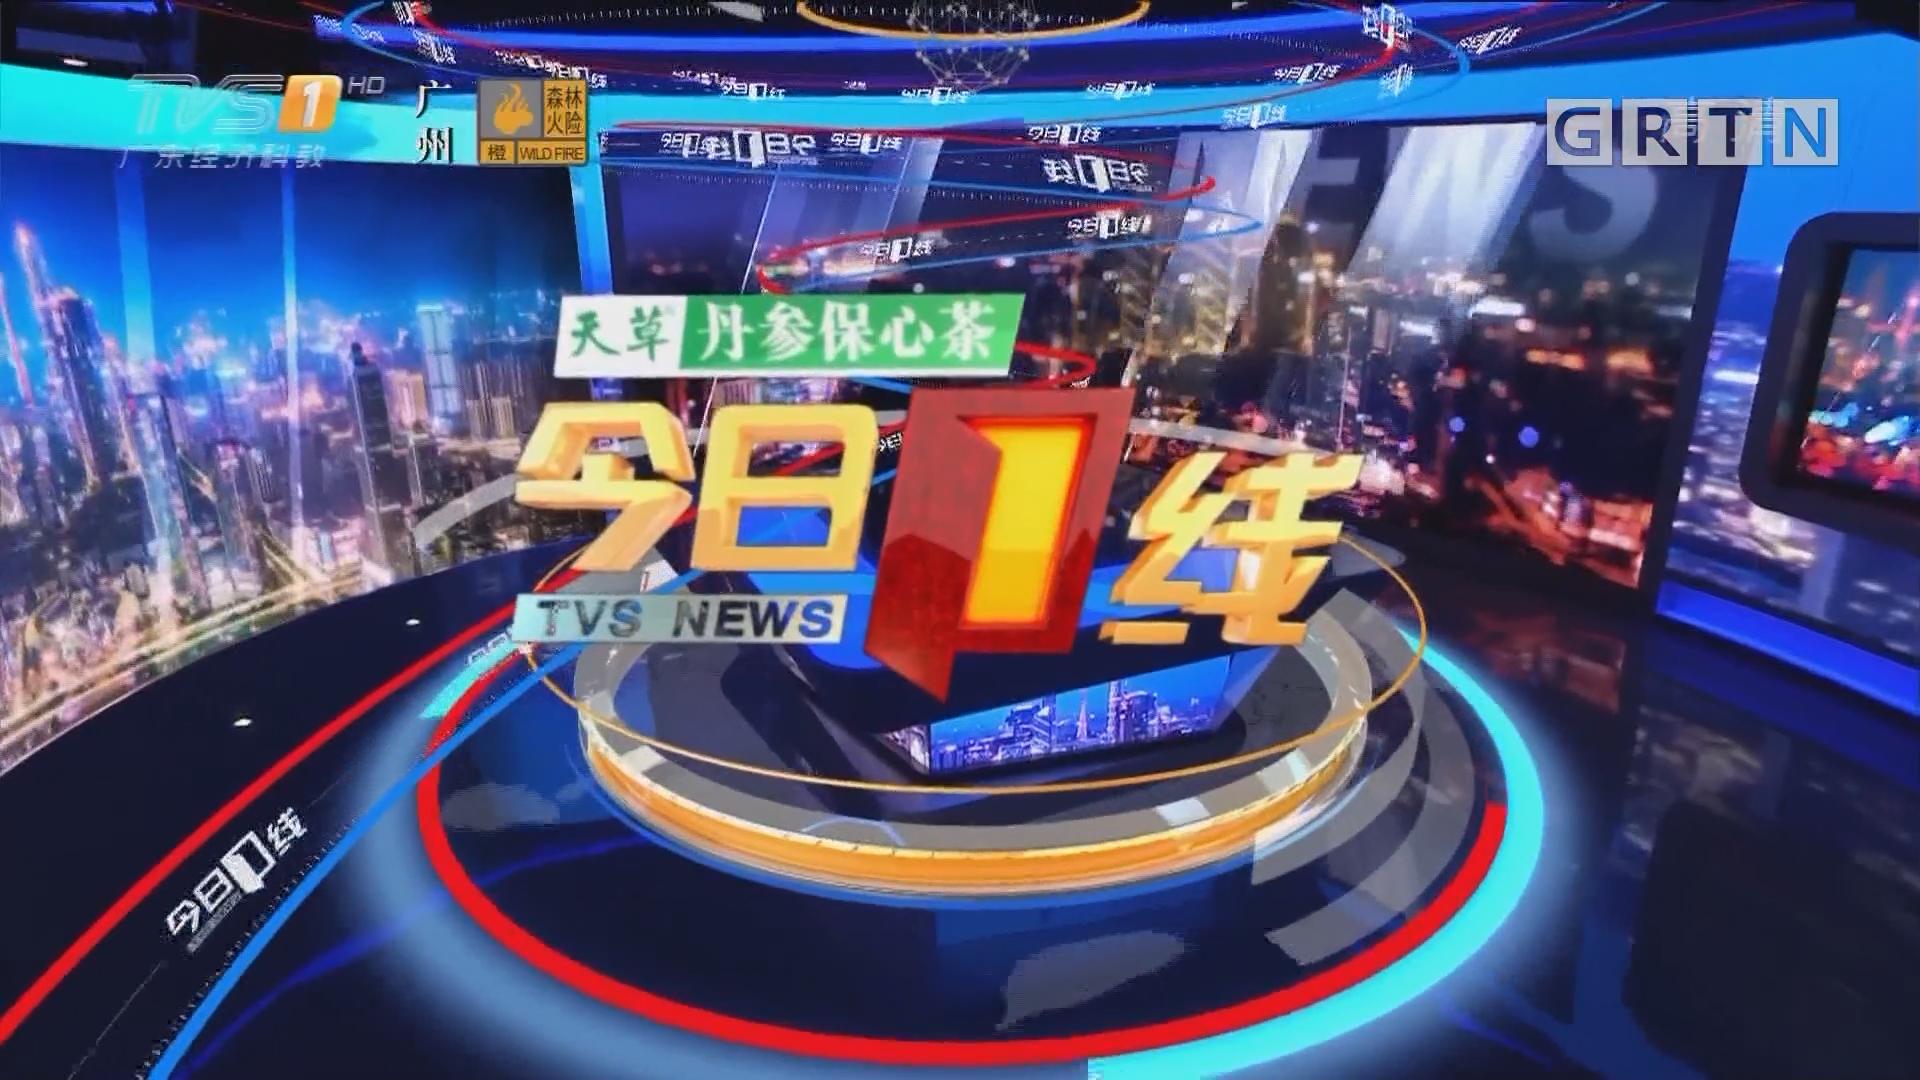 [HD][2019-02-13]今日一线:深圳:凌晨大火烧毁32辆车 257户居民紧急疏散